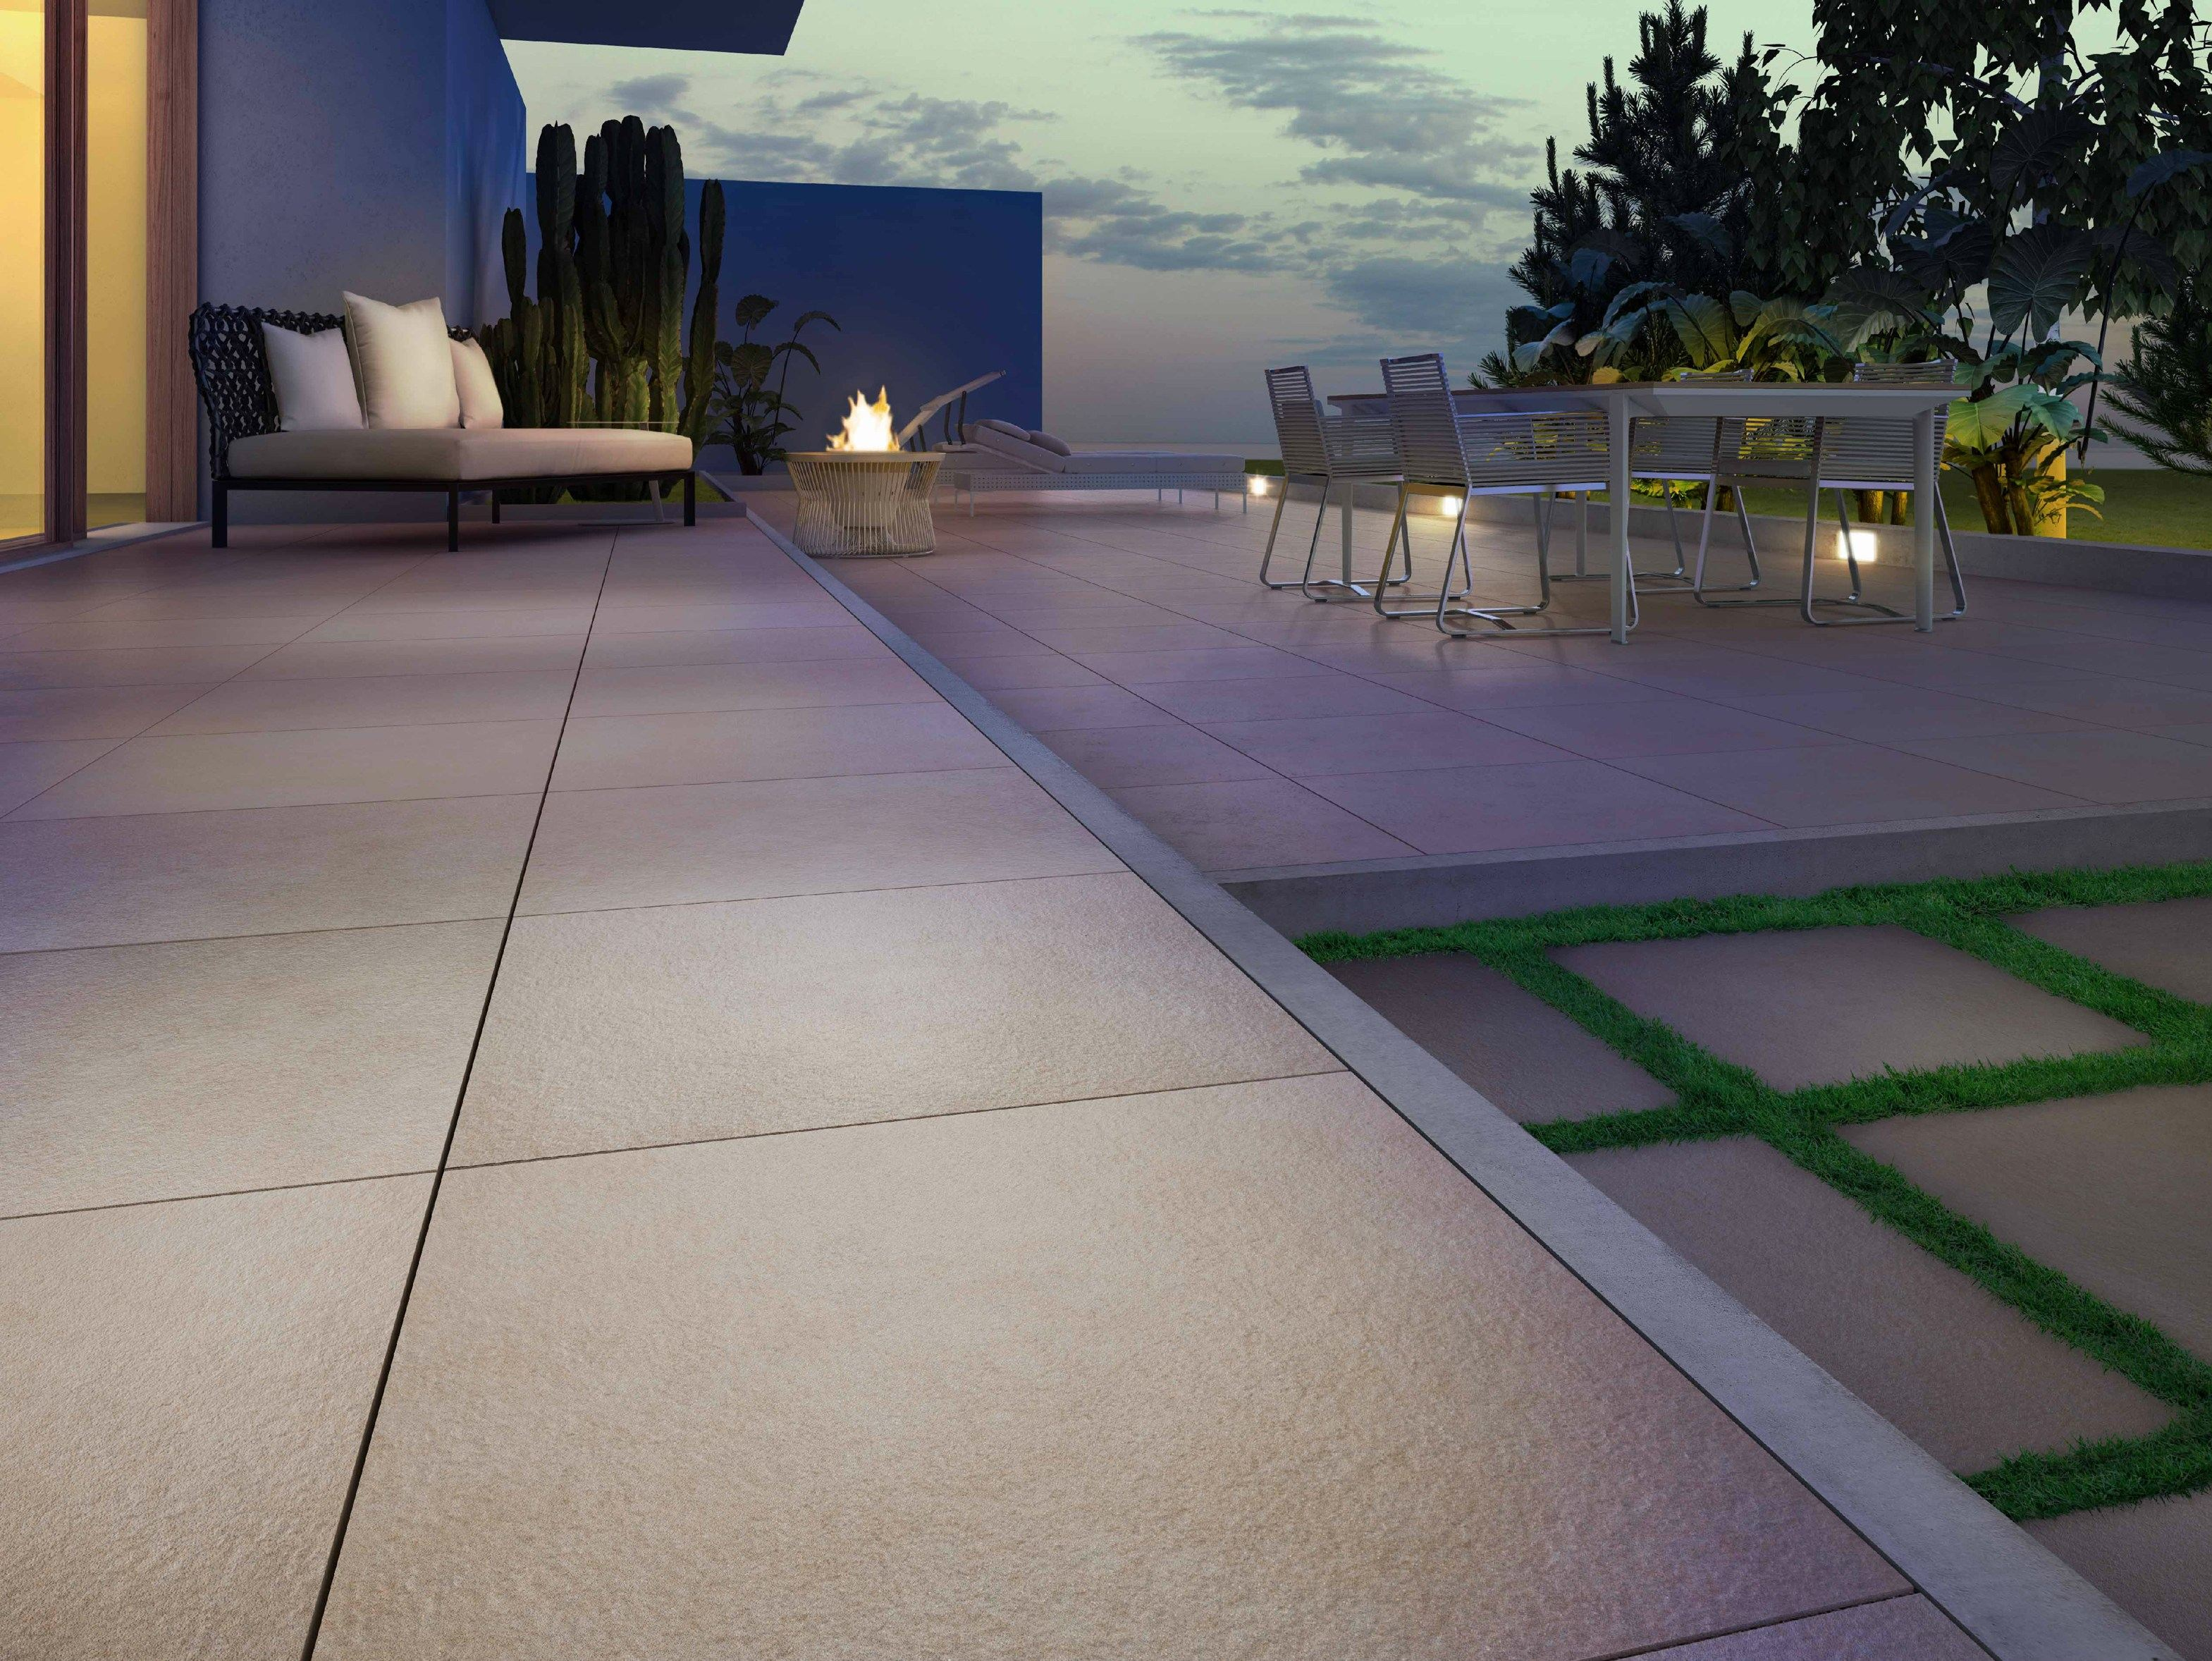 au en bodenbelag aus feinsteinzeug kerblock kollektion pietre native by casalgrande padana. Black Bedroom Furniture Sets. Home Design Ideas